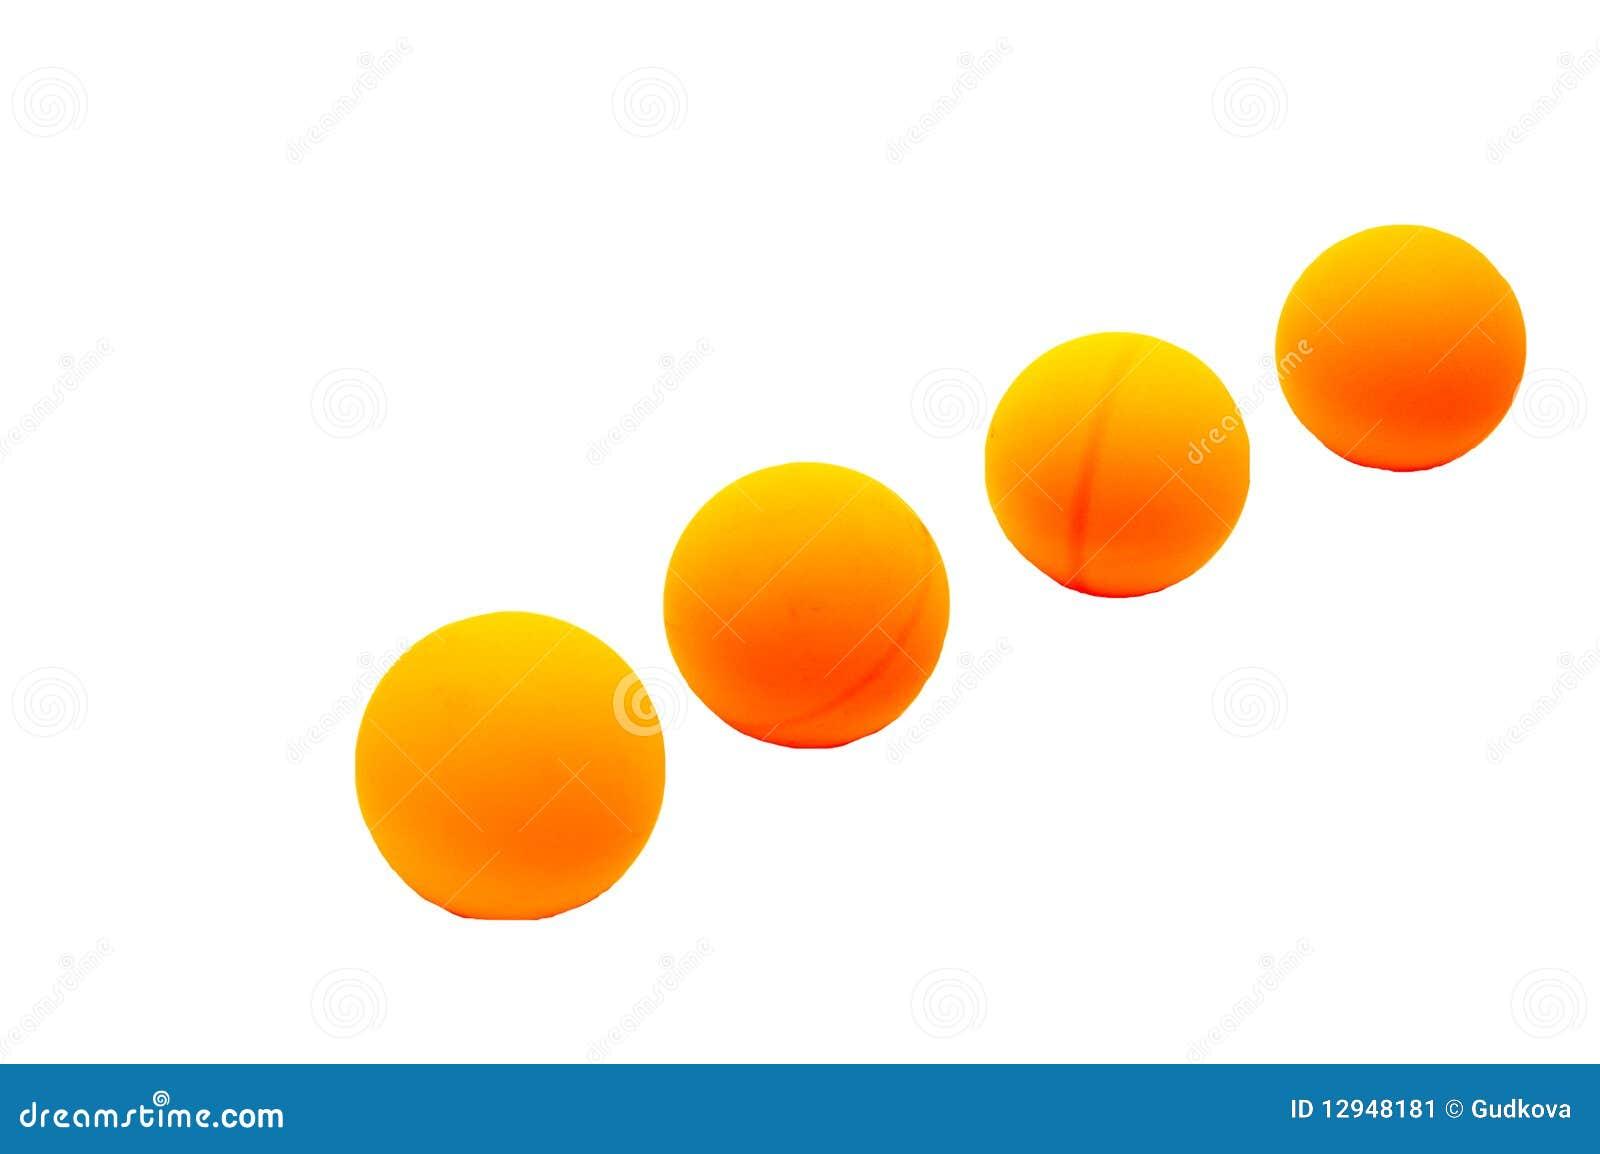 Ping pong balls stock image image 12948181 - How are ping pong balls made ...